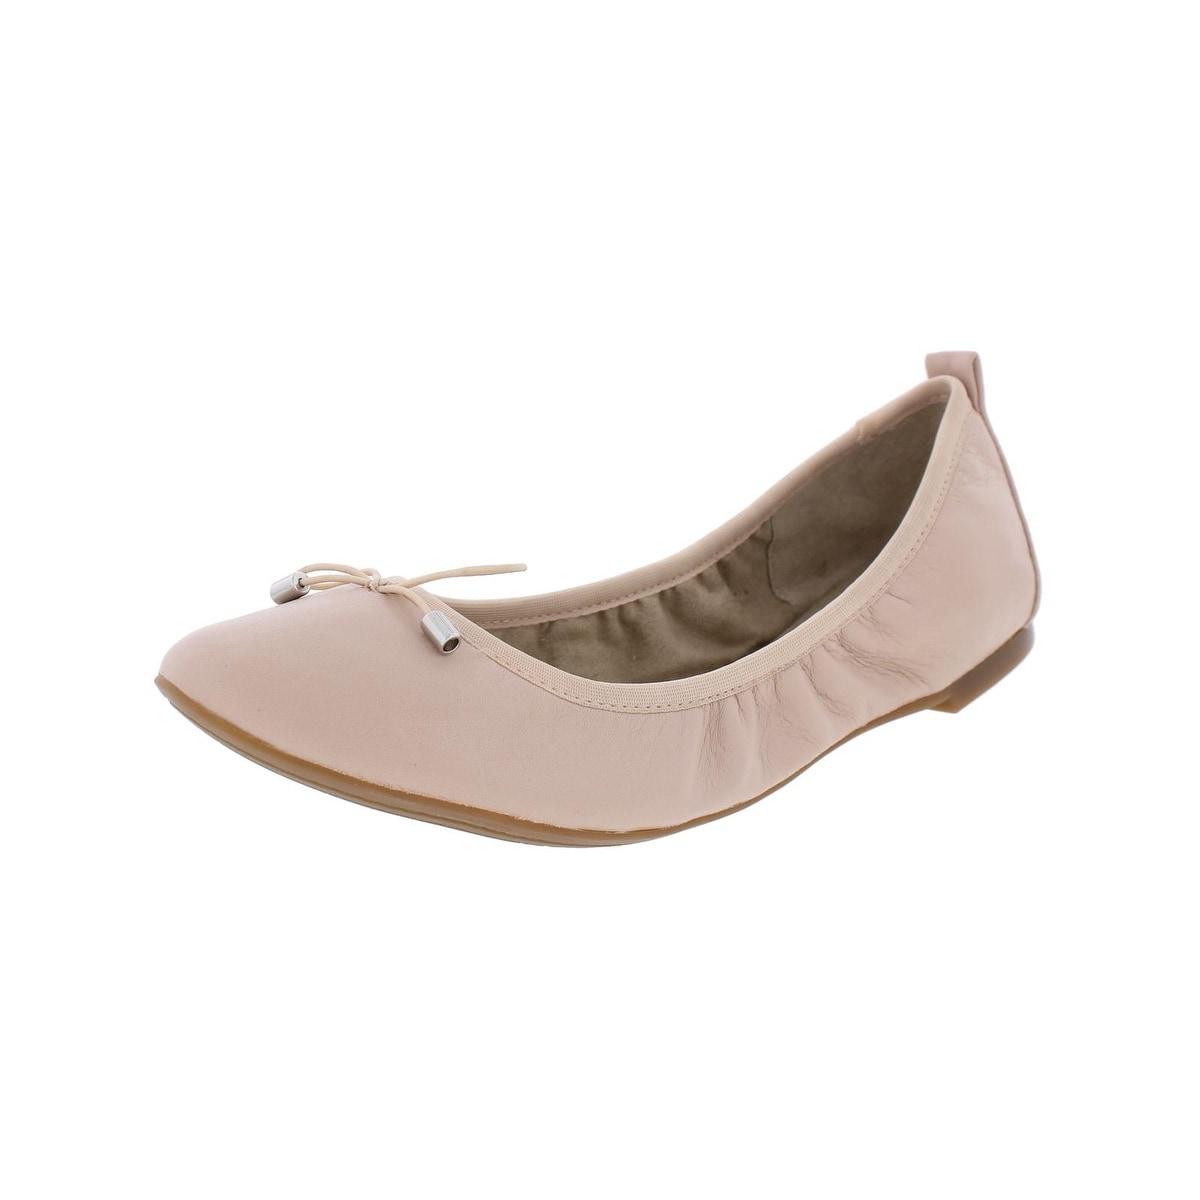 a6eec0ed722 Buy Jessica Simpson Women's Flats Online at Overstock | Our Best Women's  Shoes Deals